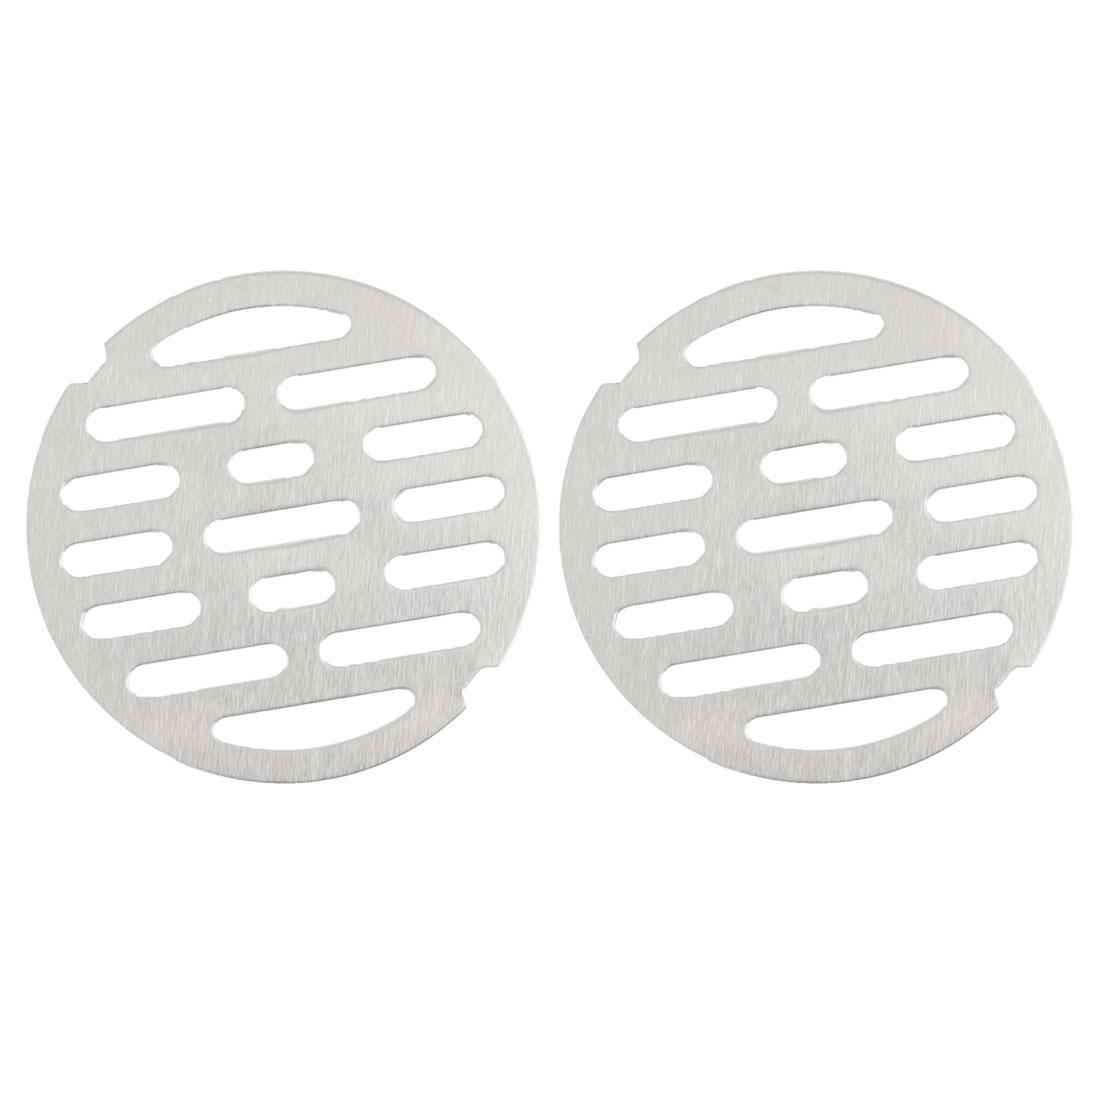 "2pcs 2.8"" Snap-in Floor Drain Cover Hair Catcher Sink Filter Strainer Stopper"